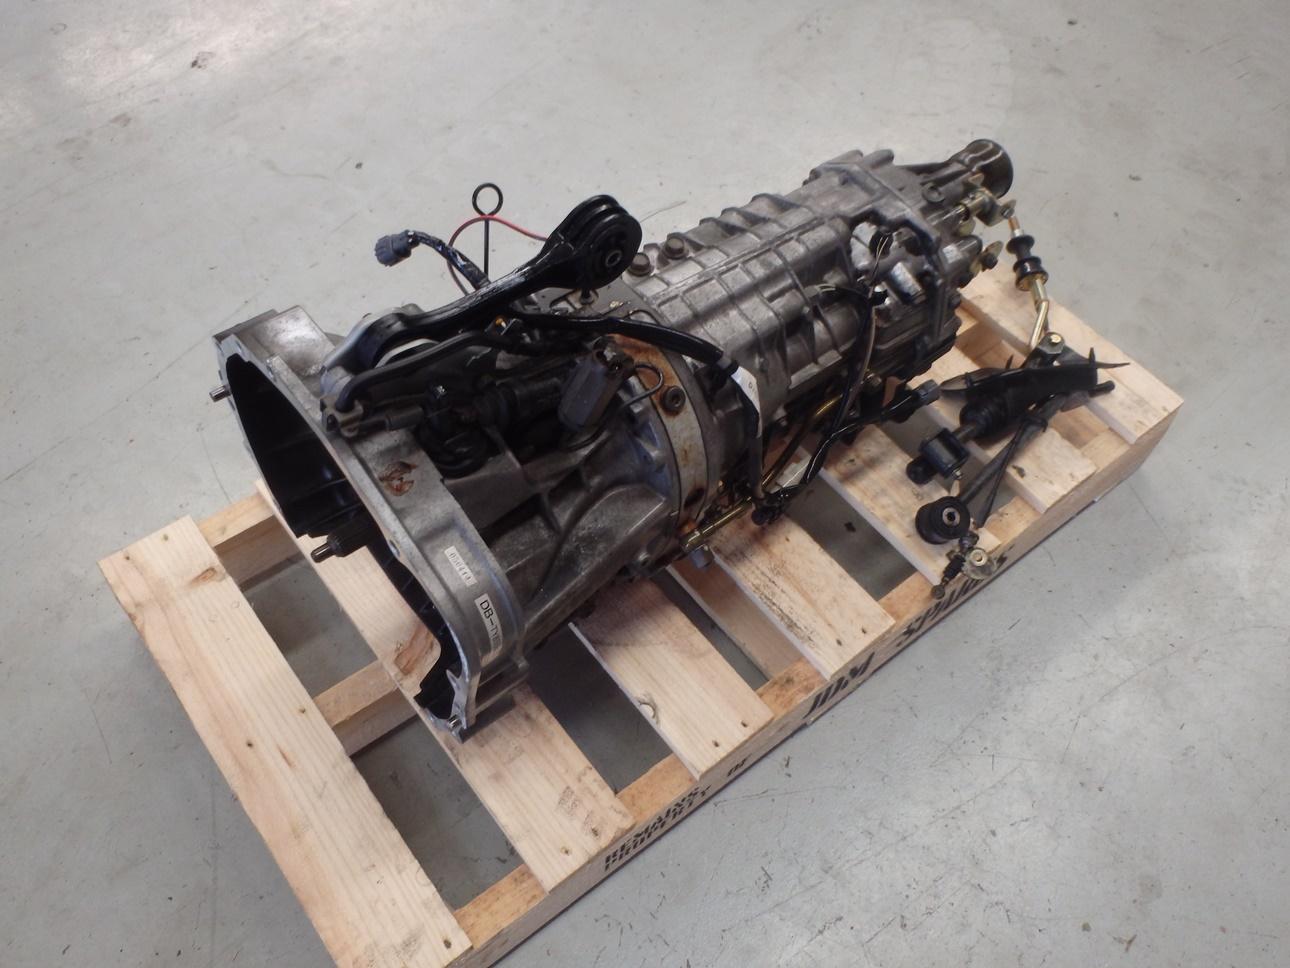 subaru forester sg9 sti 2004 6 speed manual transmission gearbox ty856wl4cc ebay. Black Bedroom Furniture Sets. Home Design Ideas